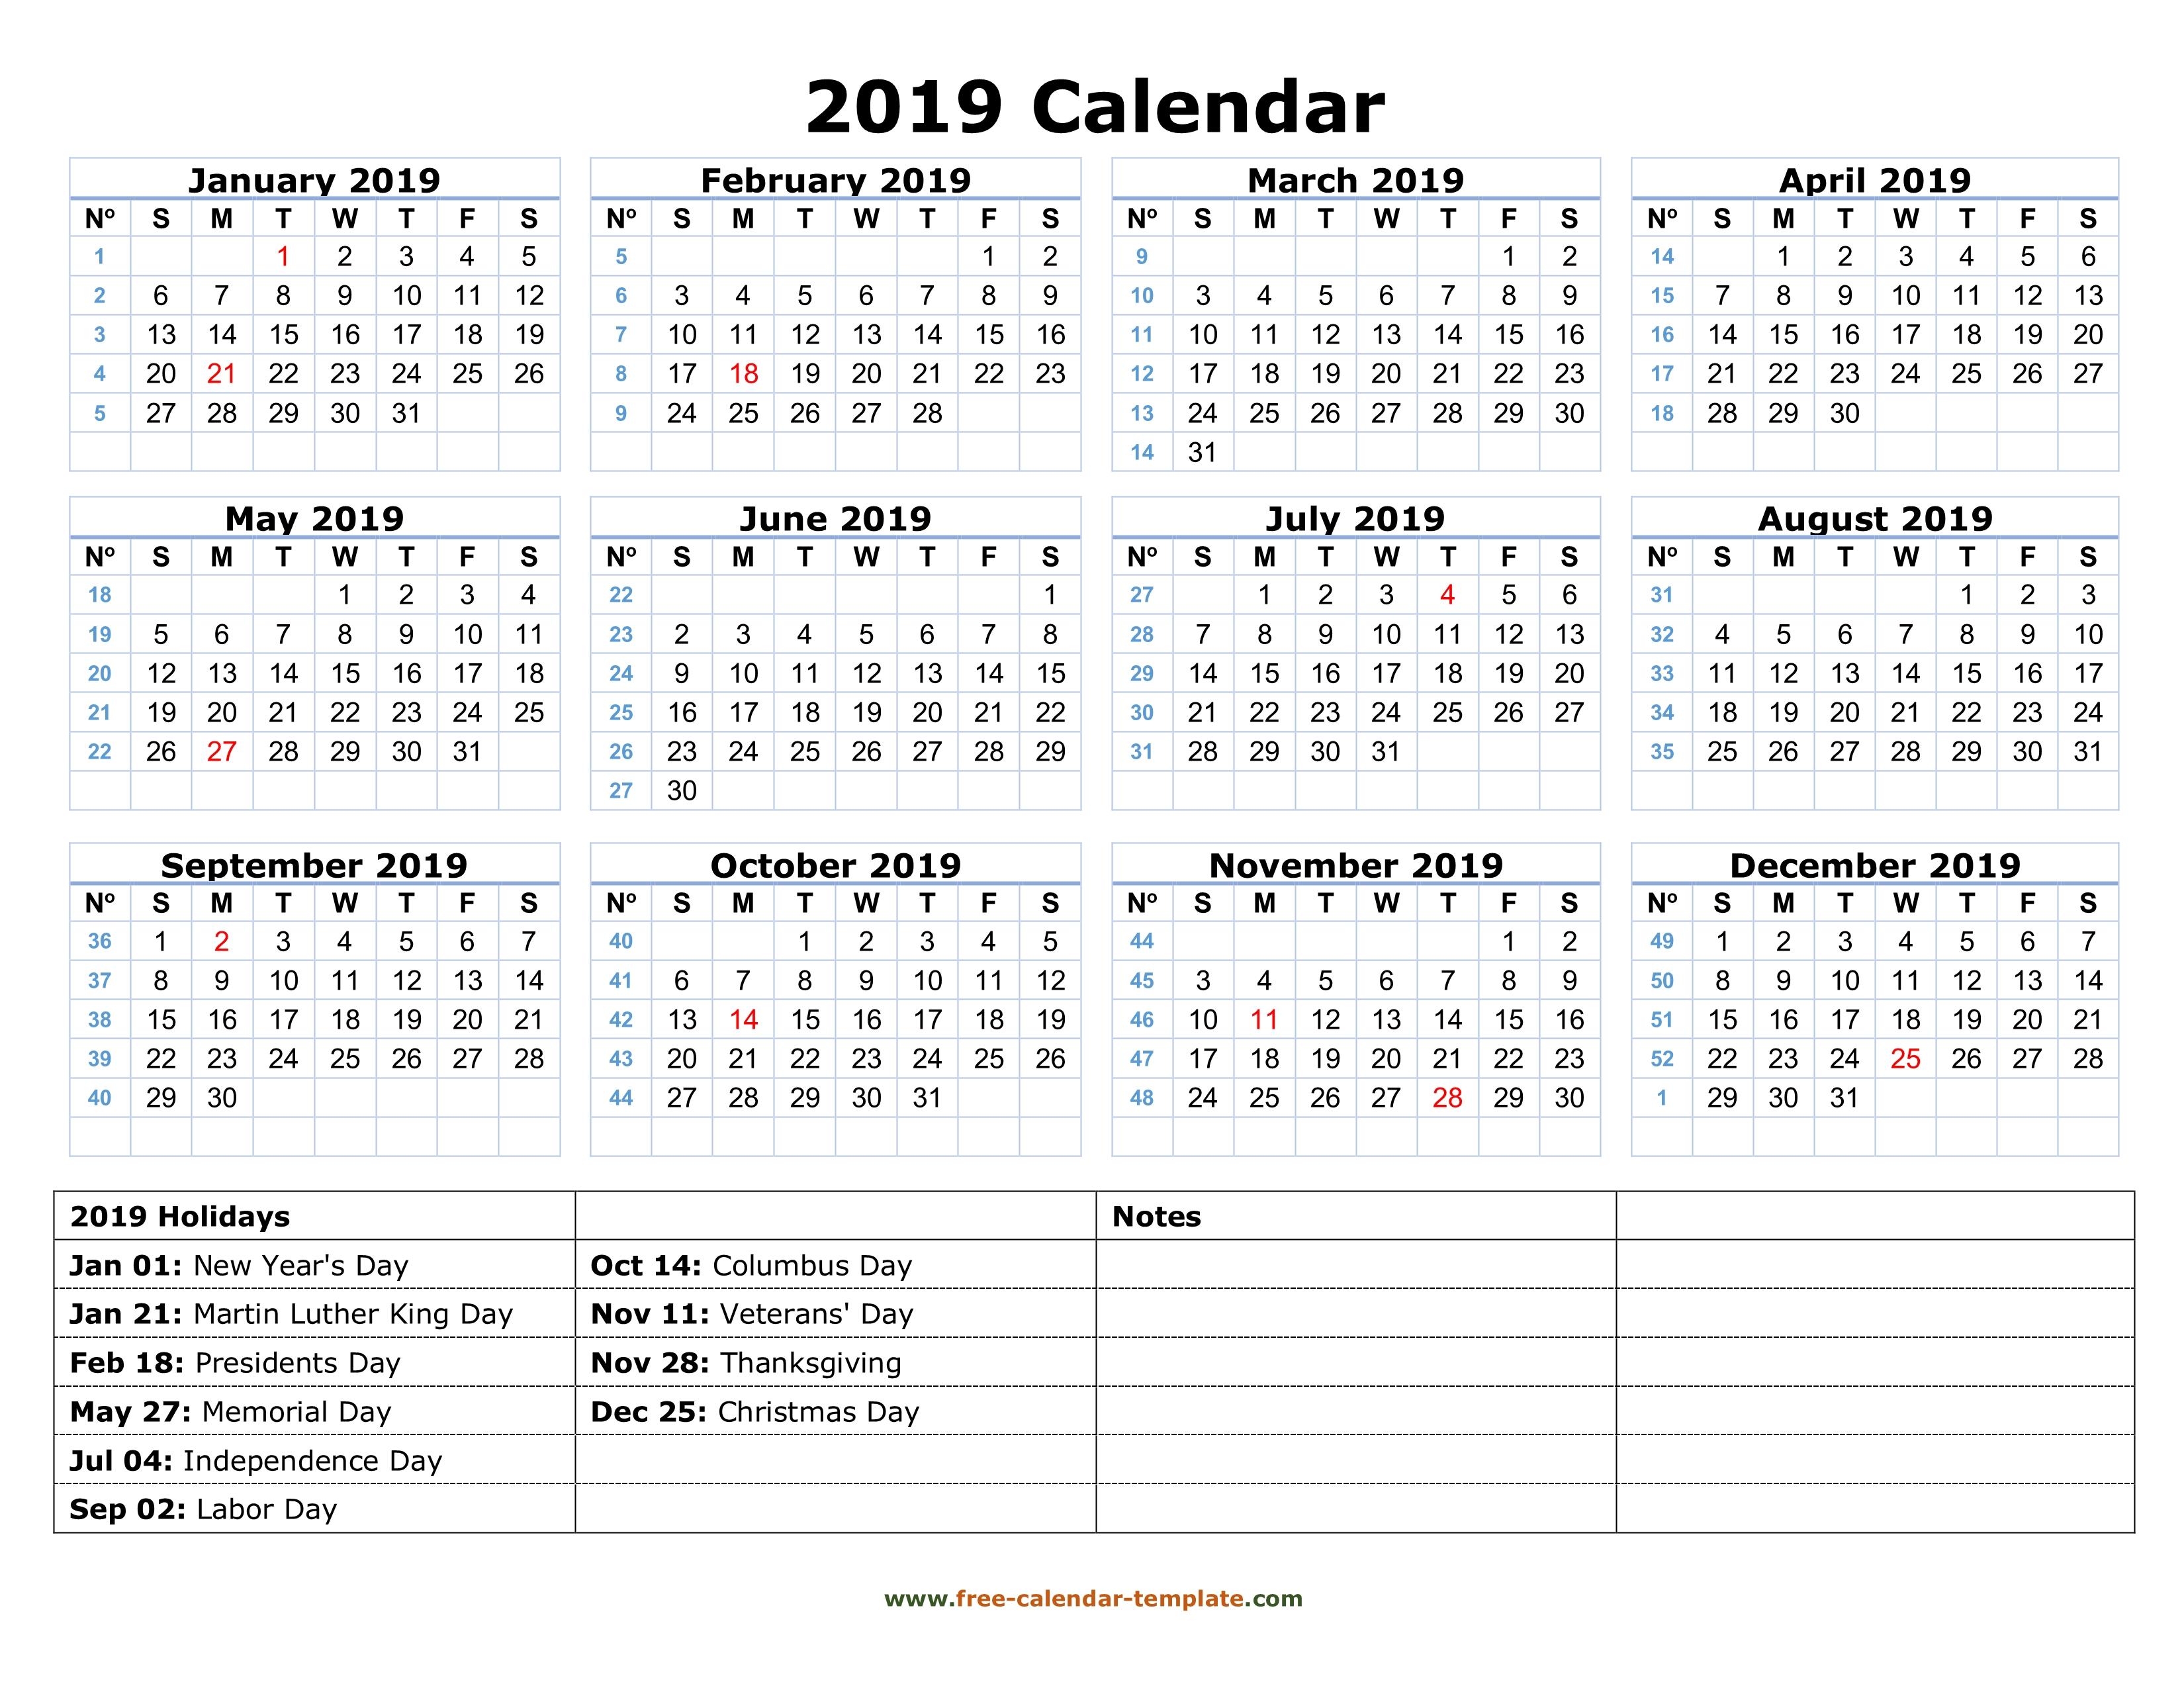 10 Year Calendar Printable - Wpa.wpart.co